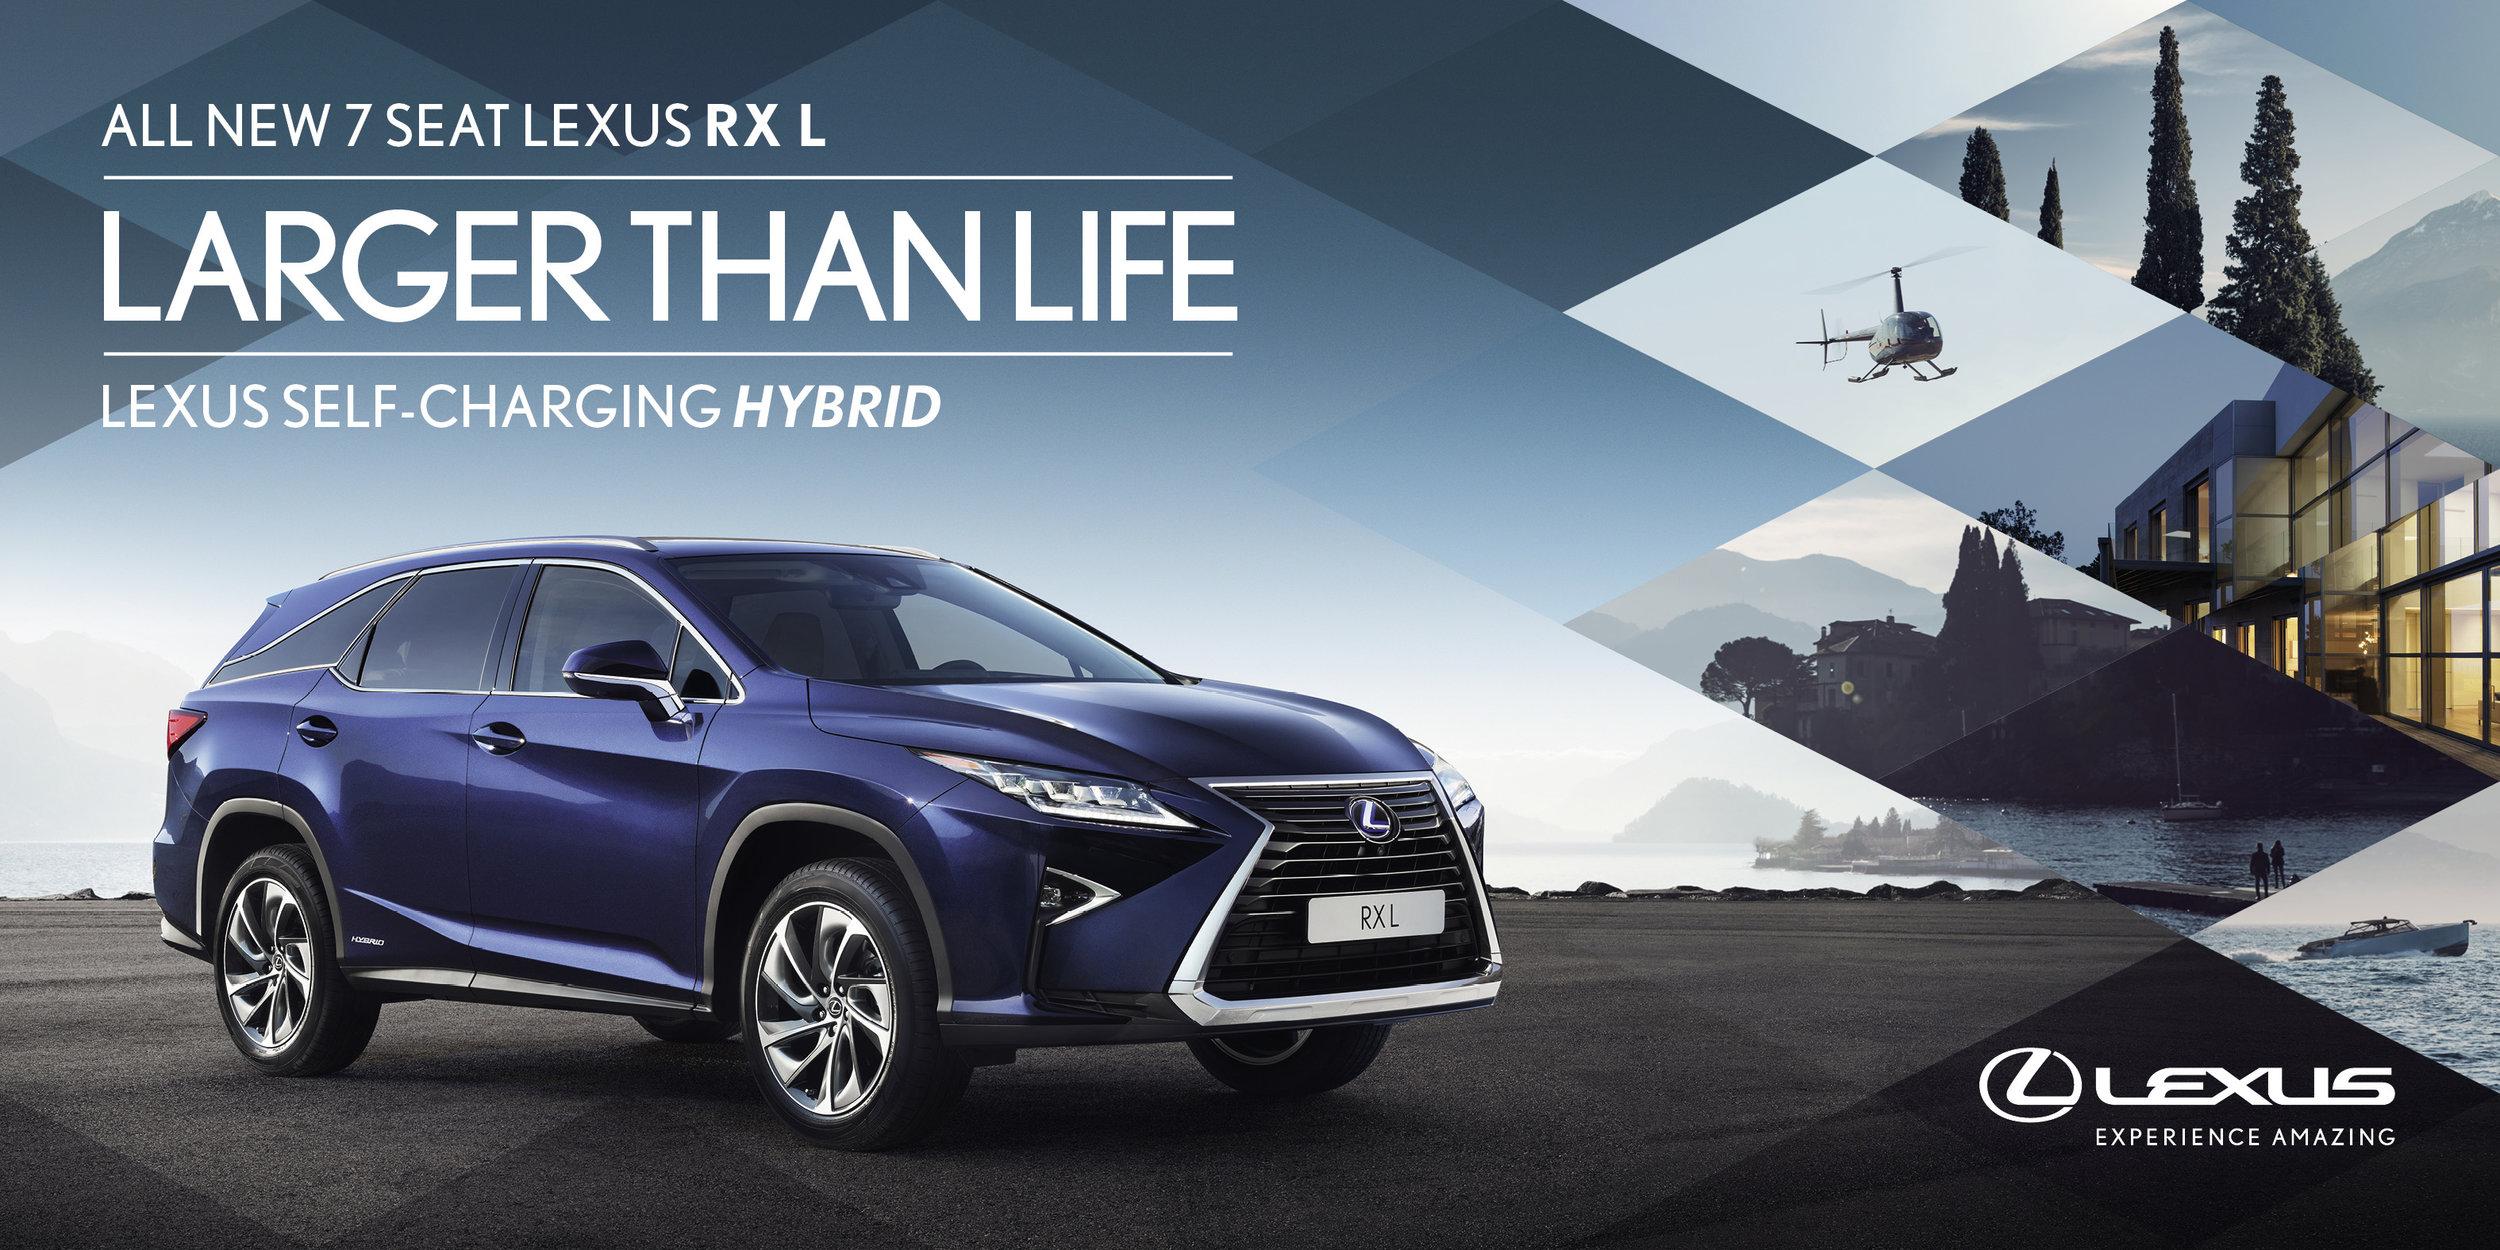 LS029P_RXL_Hybrid_2017_48$_Rural.jpg